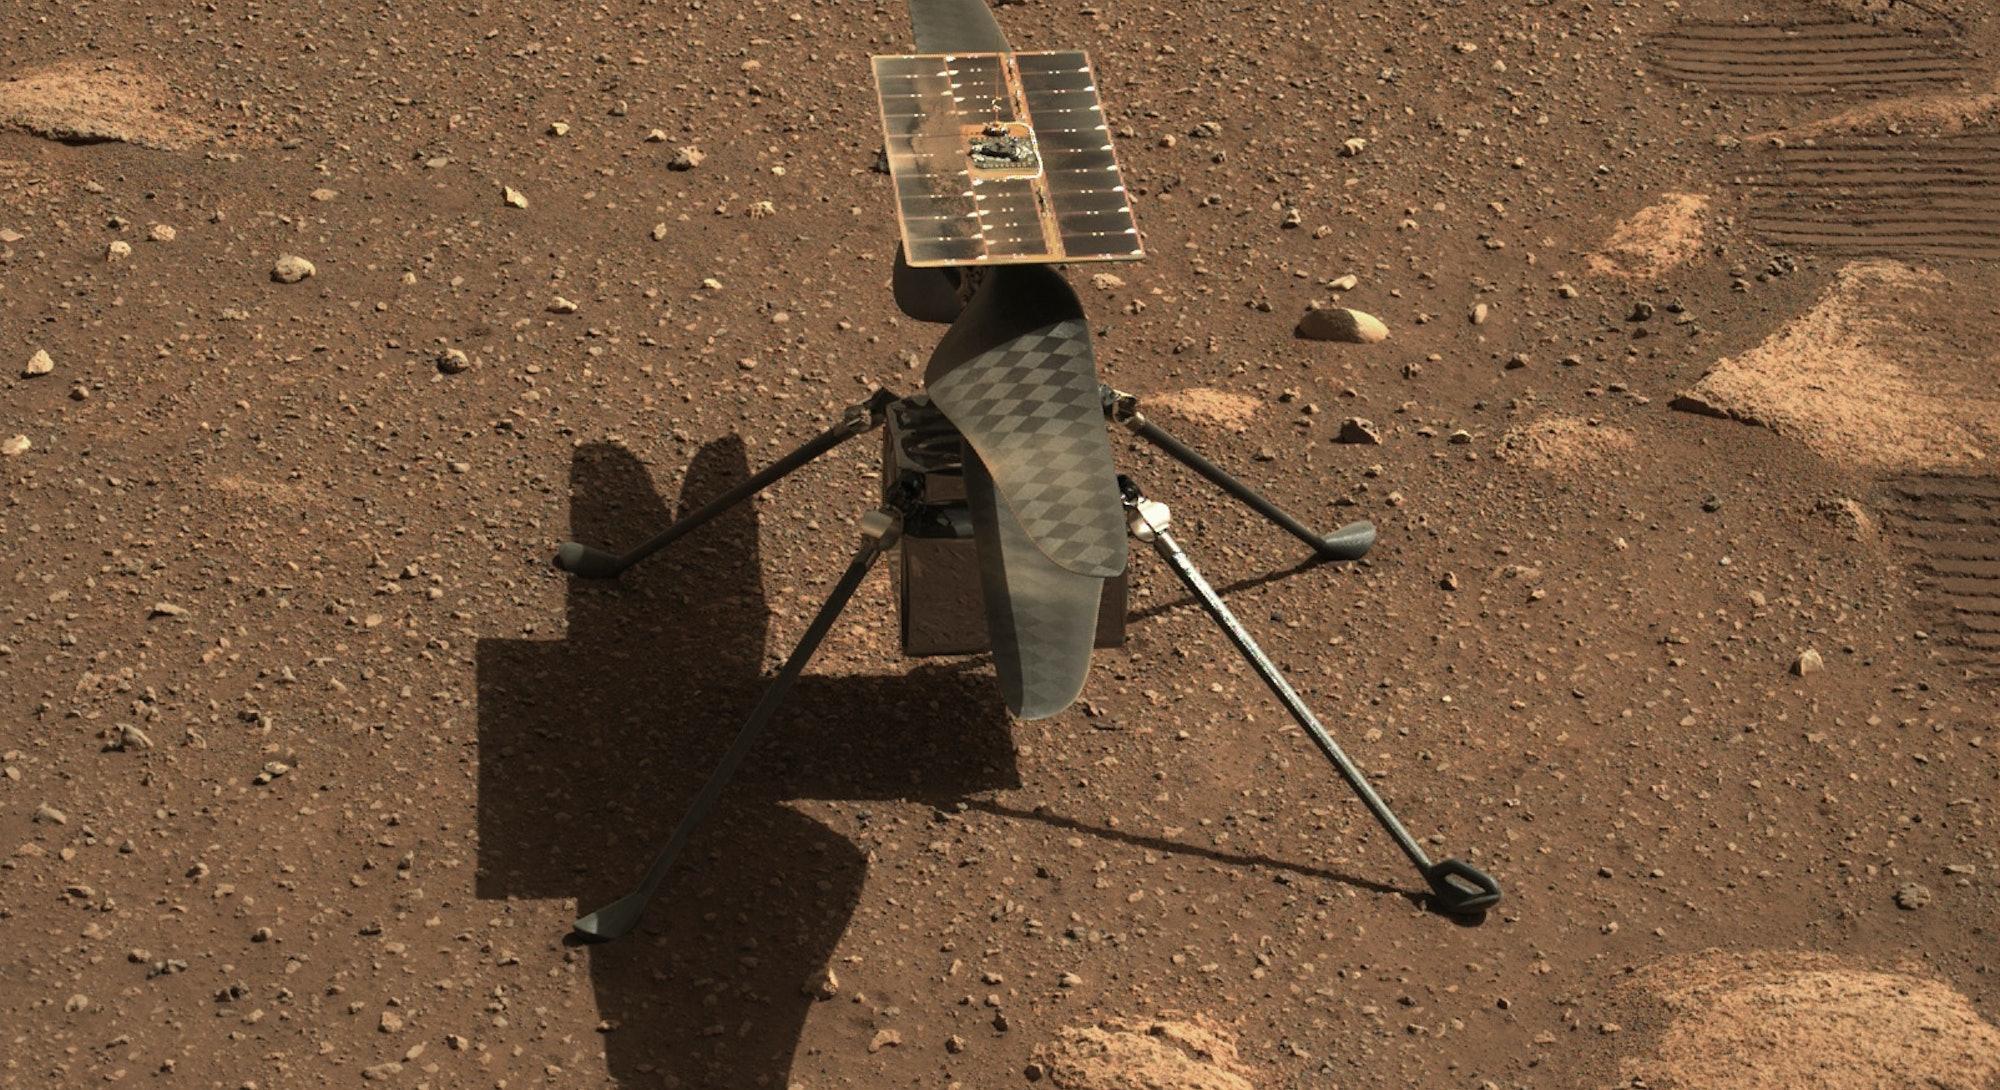 NASA Ingenuity helicopter on Mars.